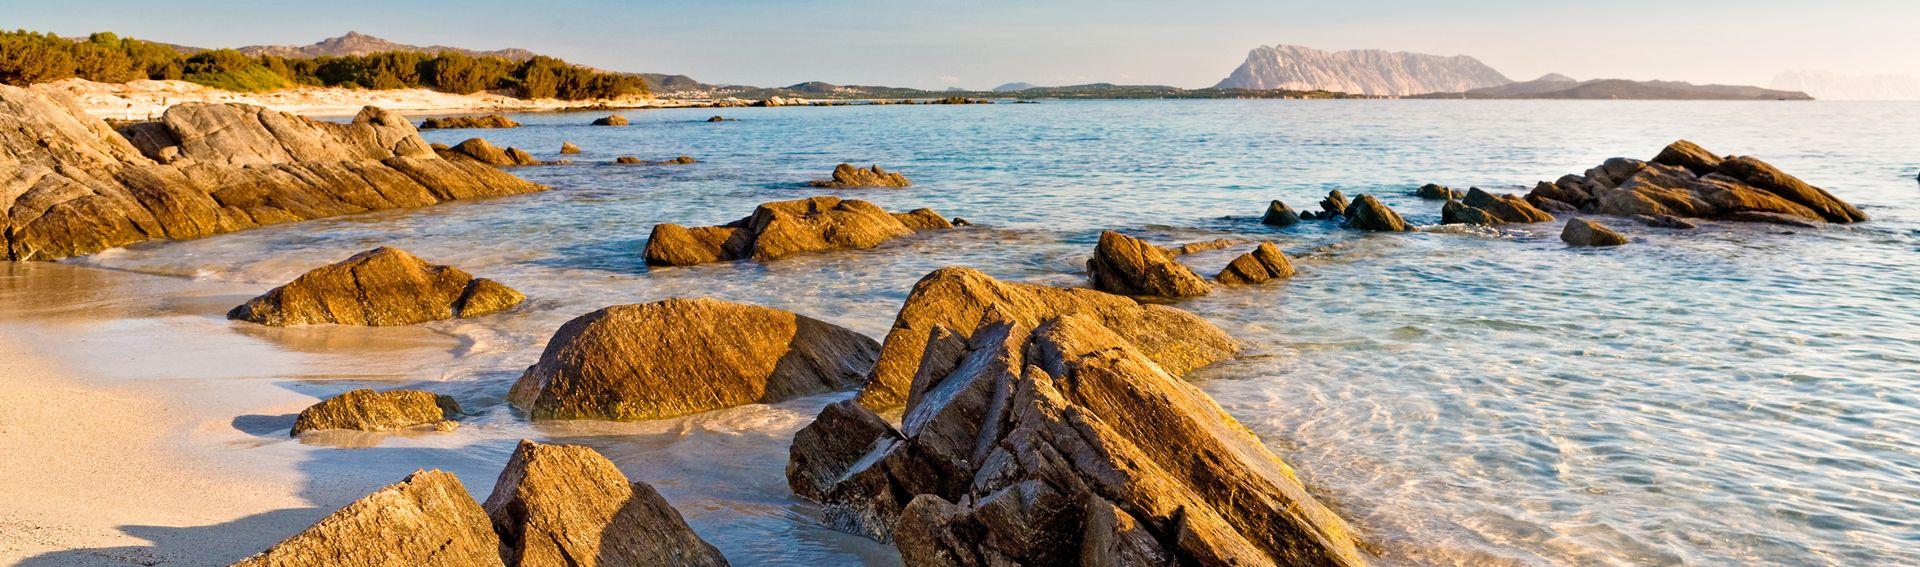 Nordsardinien (ohne Costa Smeralda)